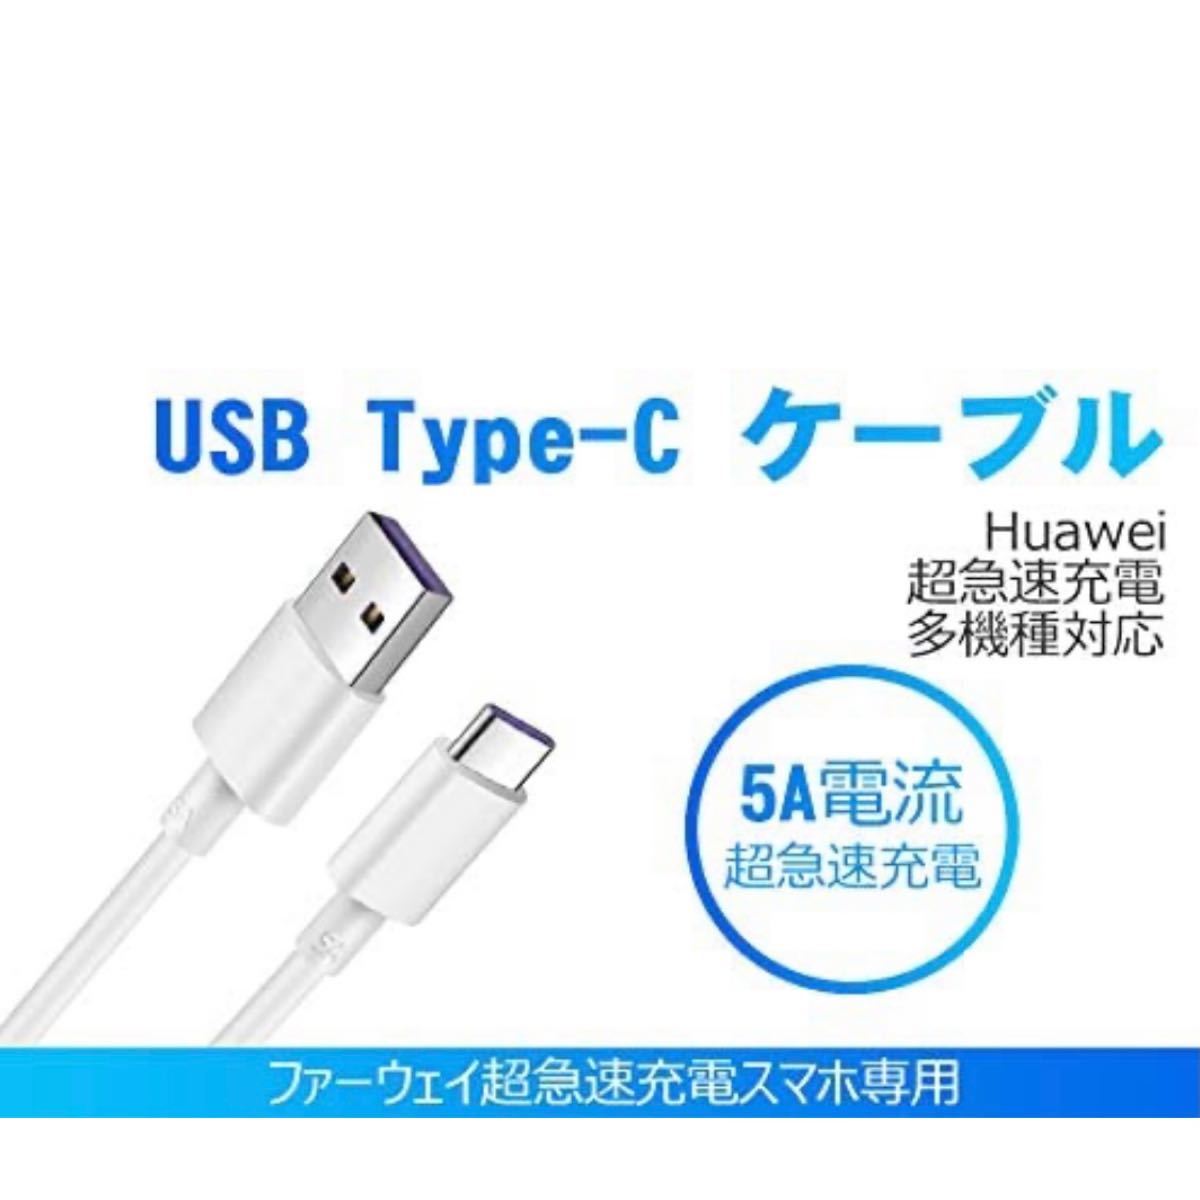 2M Type C USB 充電ケーブル 5A 超急速充電 Huawei SuperCharge対応 Type-C機器対応 TPE